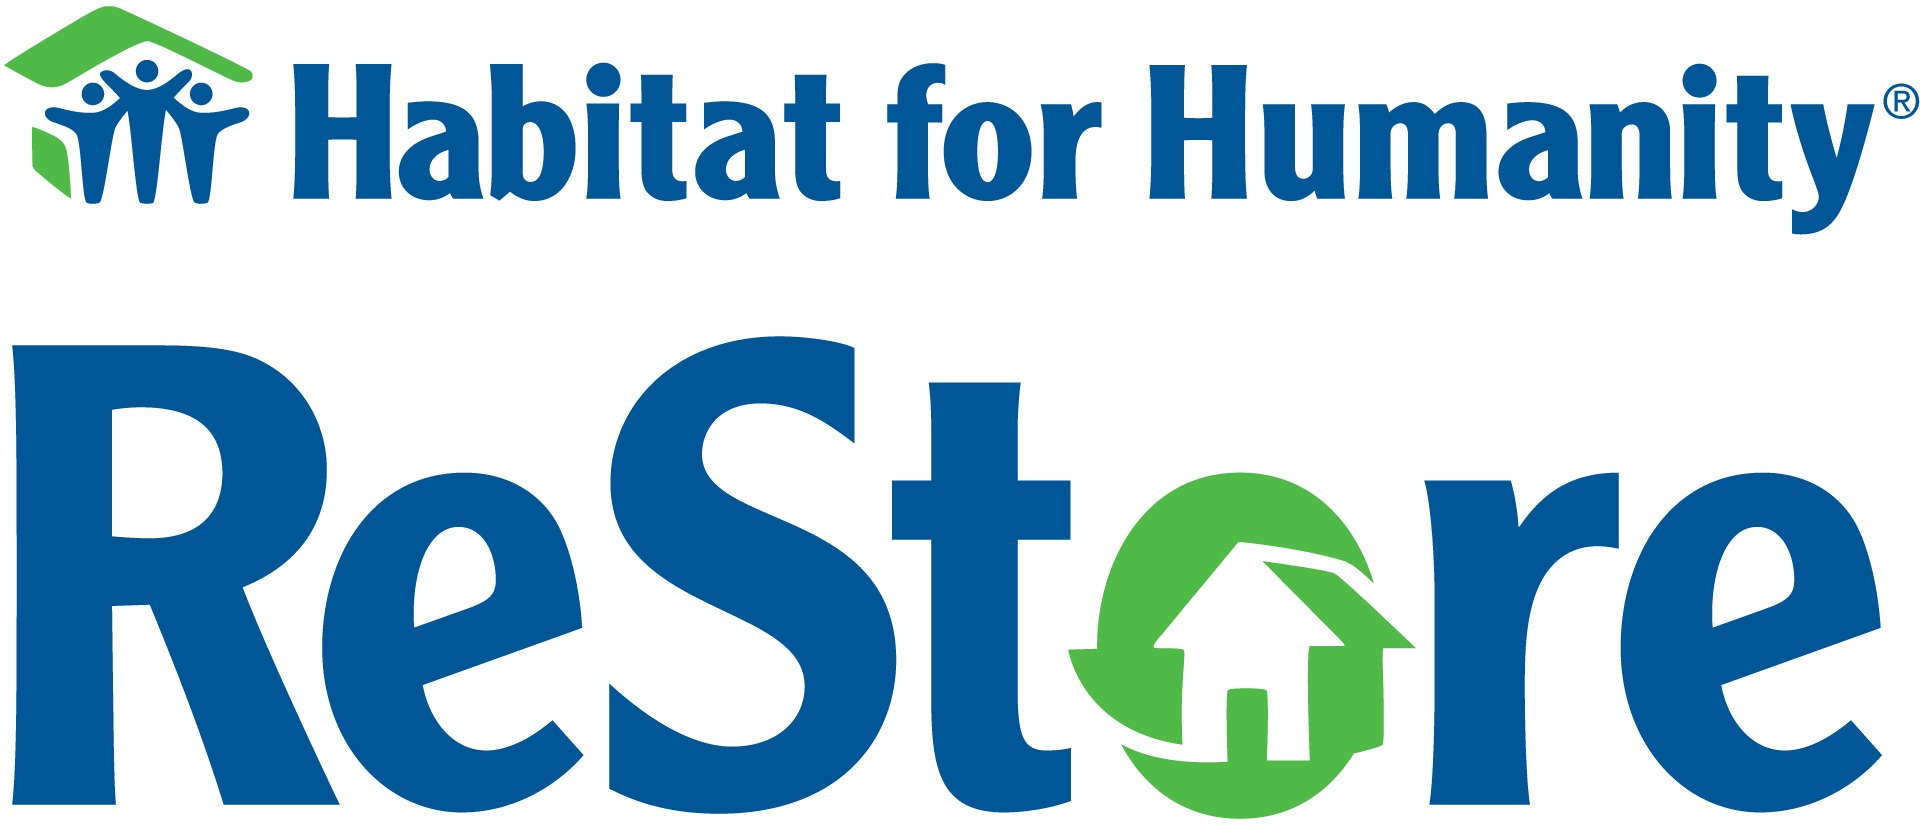 restore logo new hi res habitat for humanity prince william county